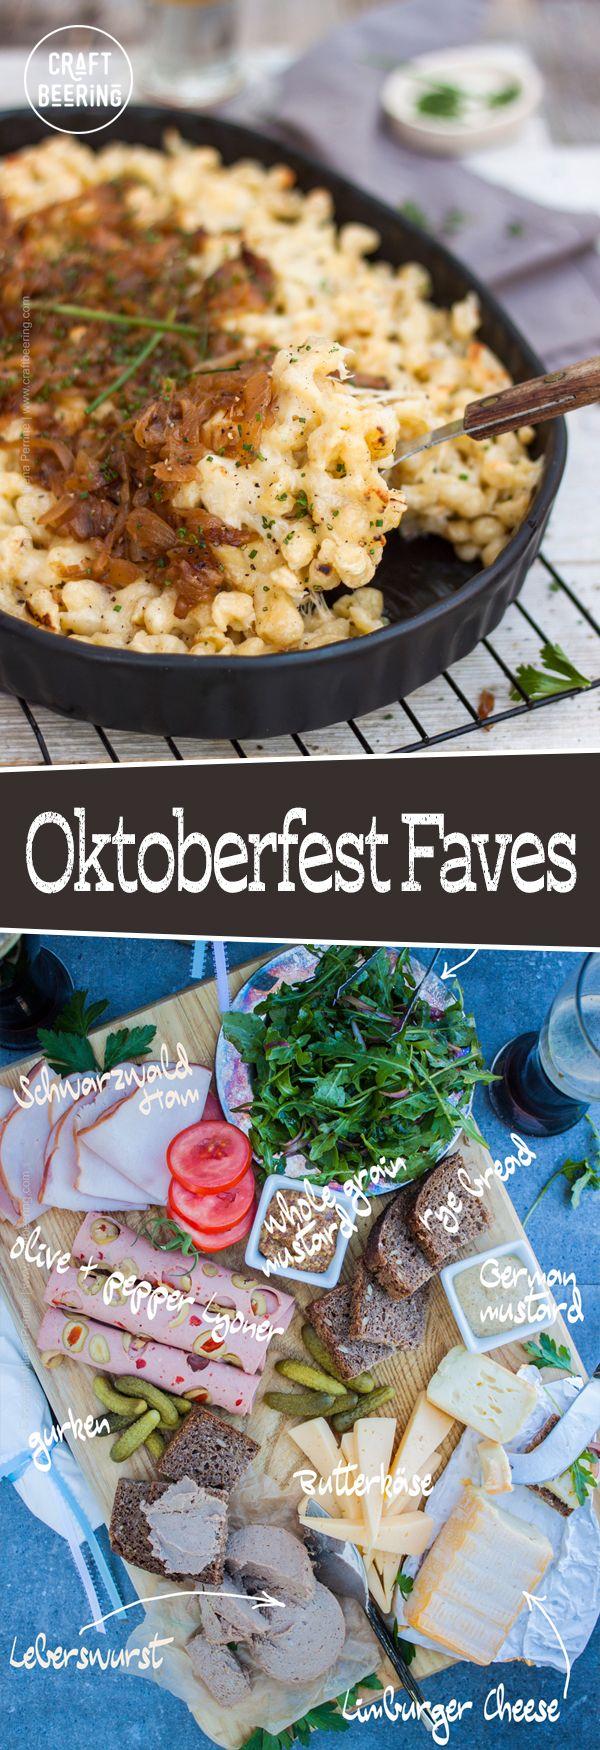 Beer Garden Menu Oktoberfest food, International recipes